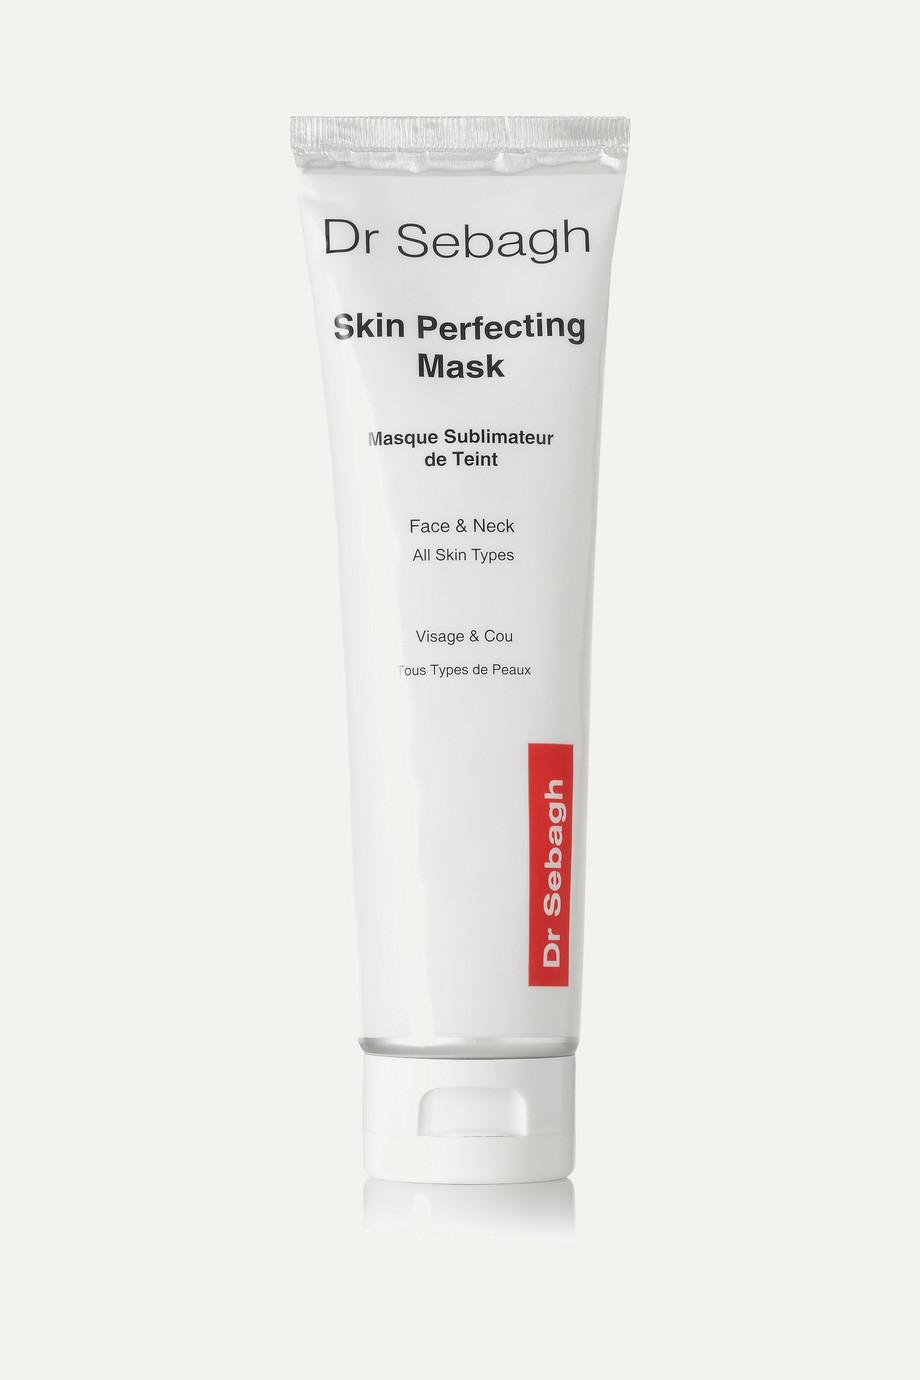 Dr Sebagh Skin Perfecting Mask, 150ml